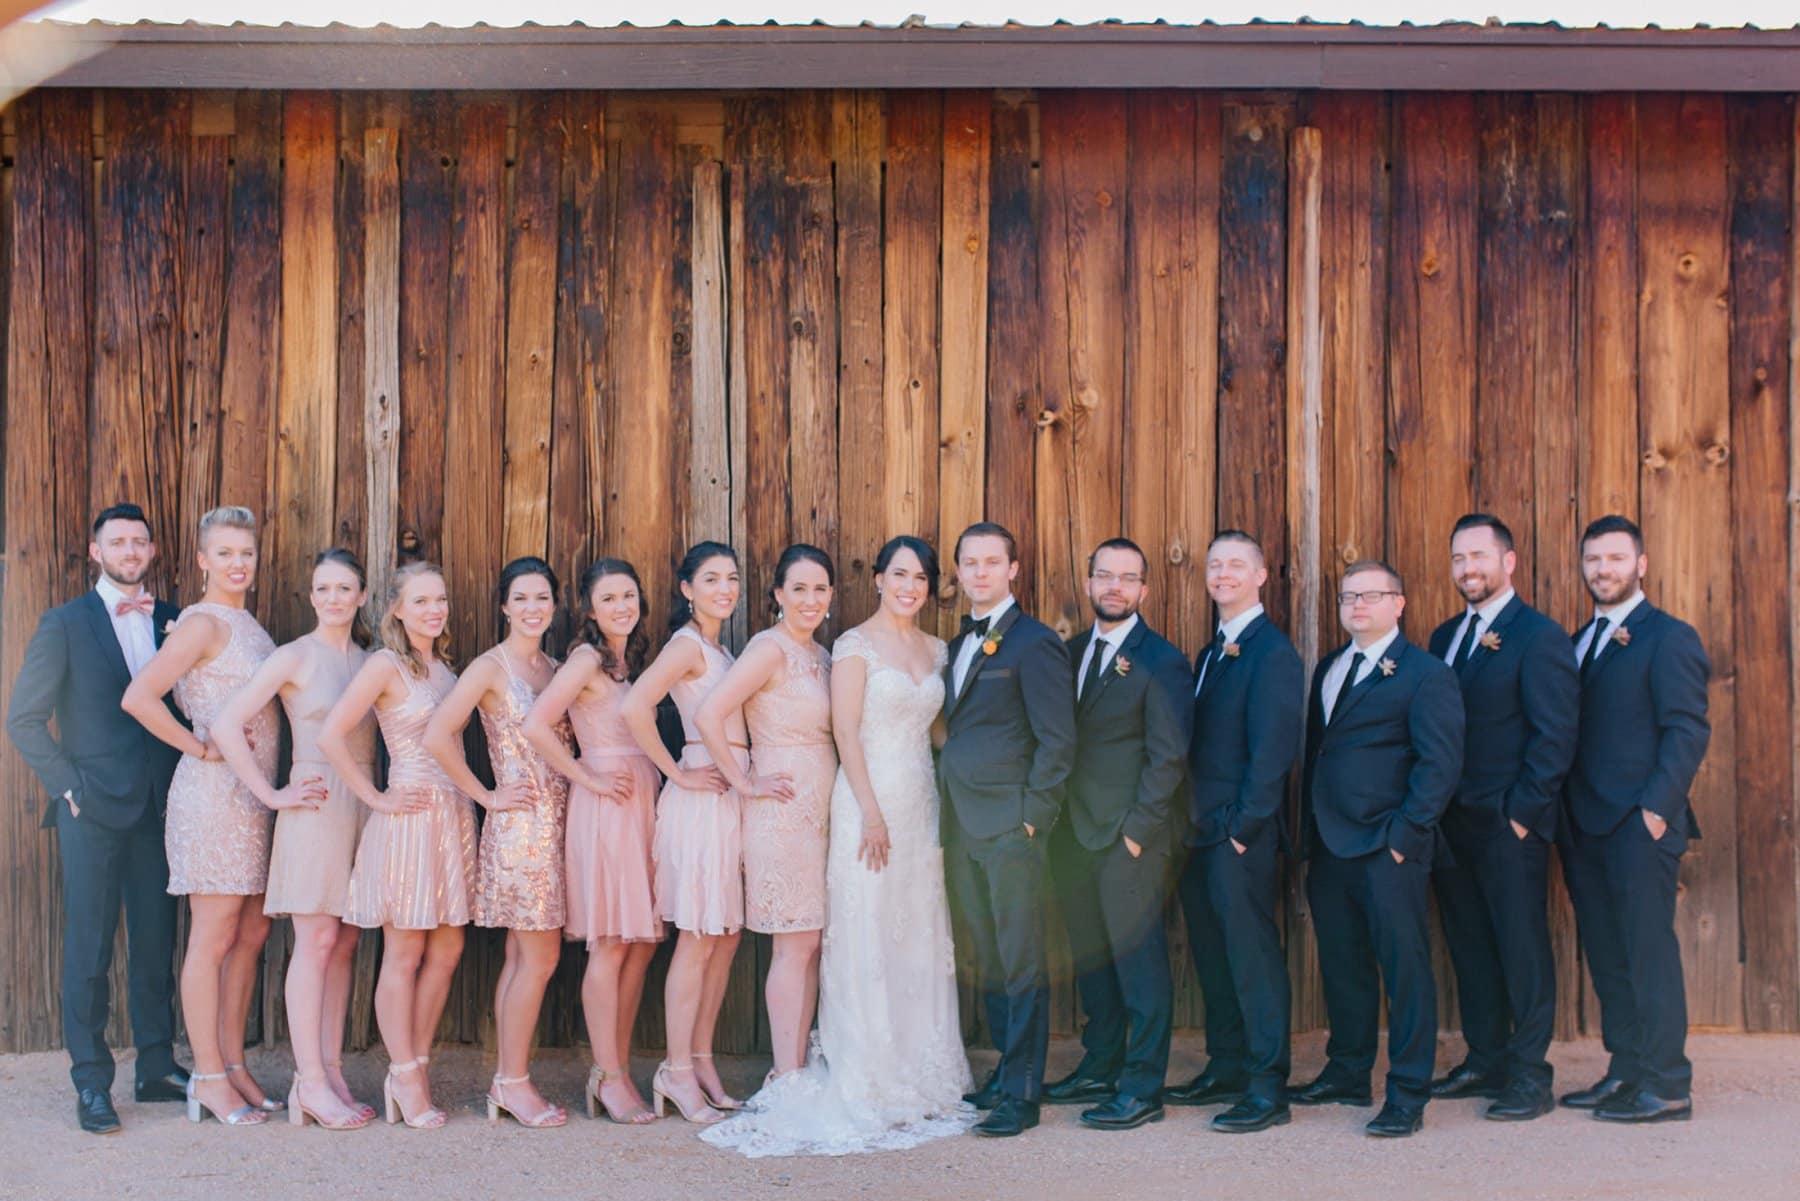 Desert Foothills wedding barn wedding party